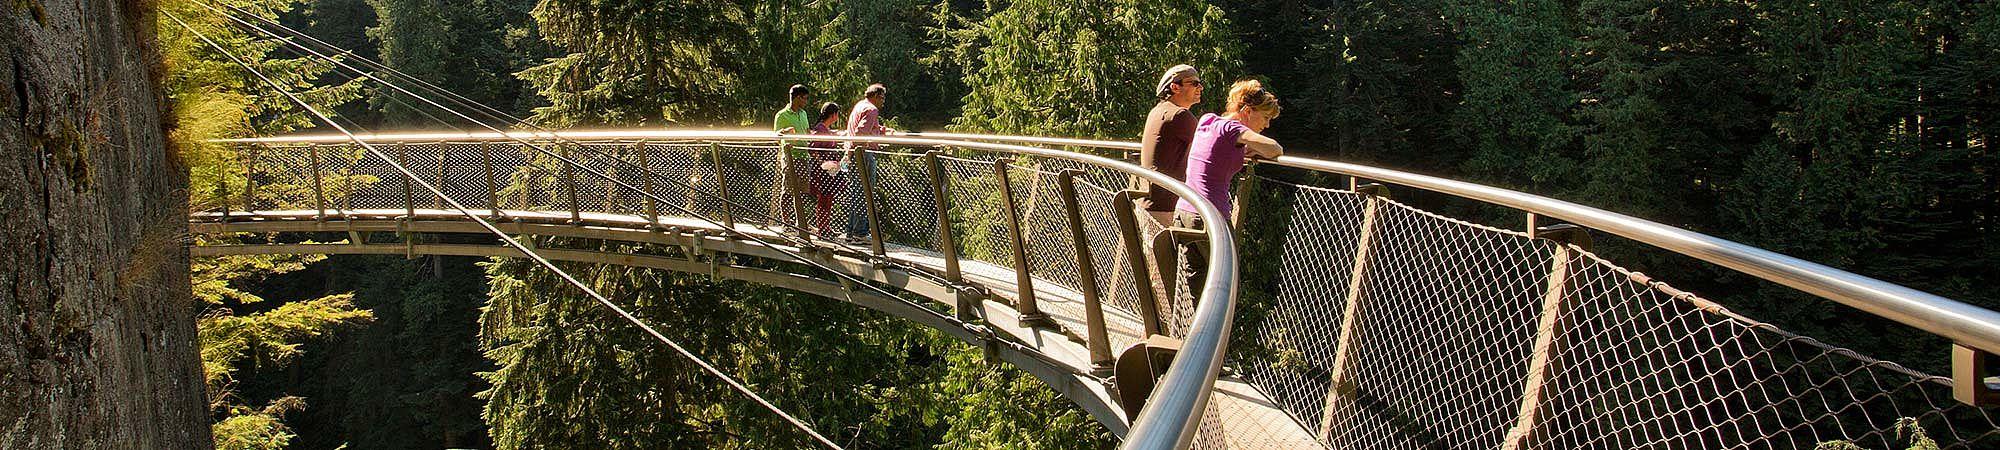 Hängebrücke Geländerfüllung X-TEND Edelstahl-Seilnetz